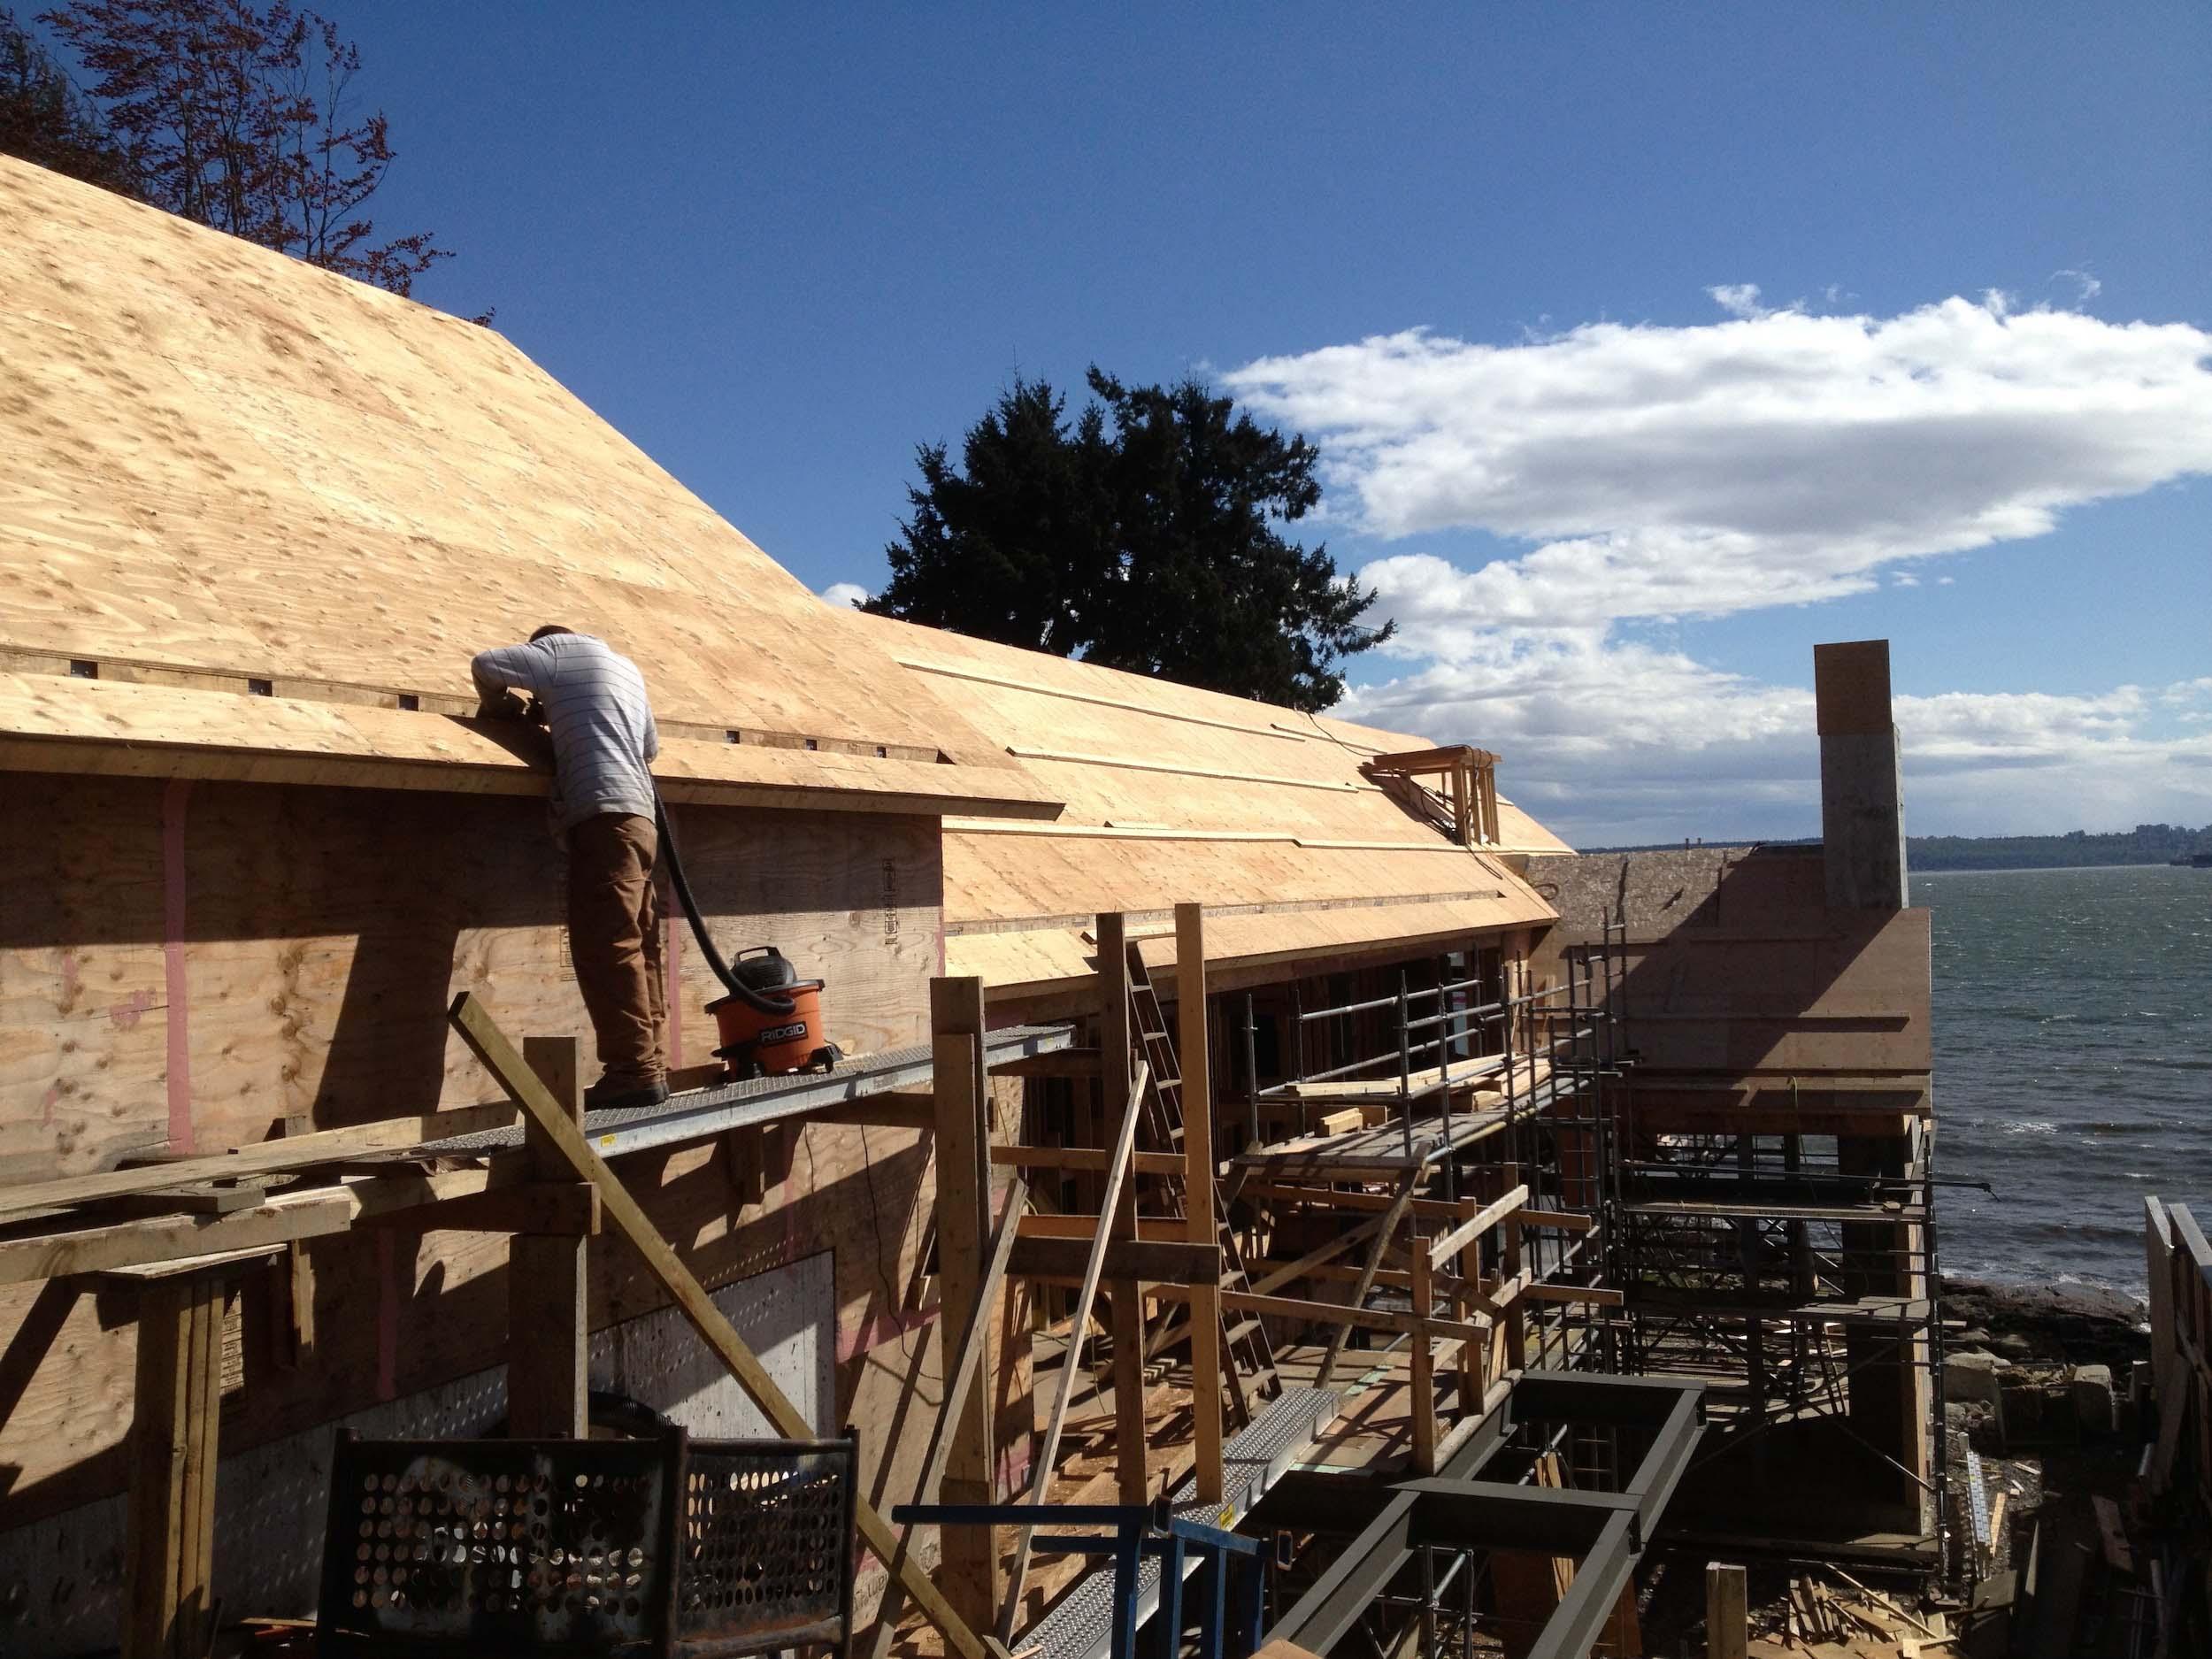 Postle_Construction_WoodFraming30.jpg